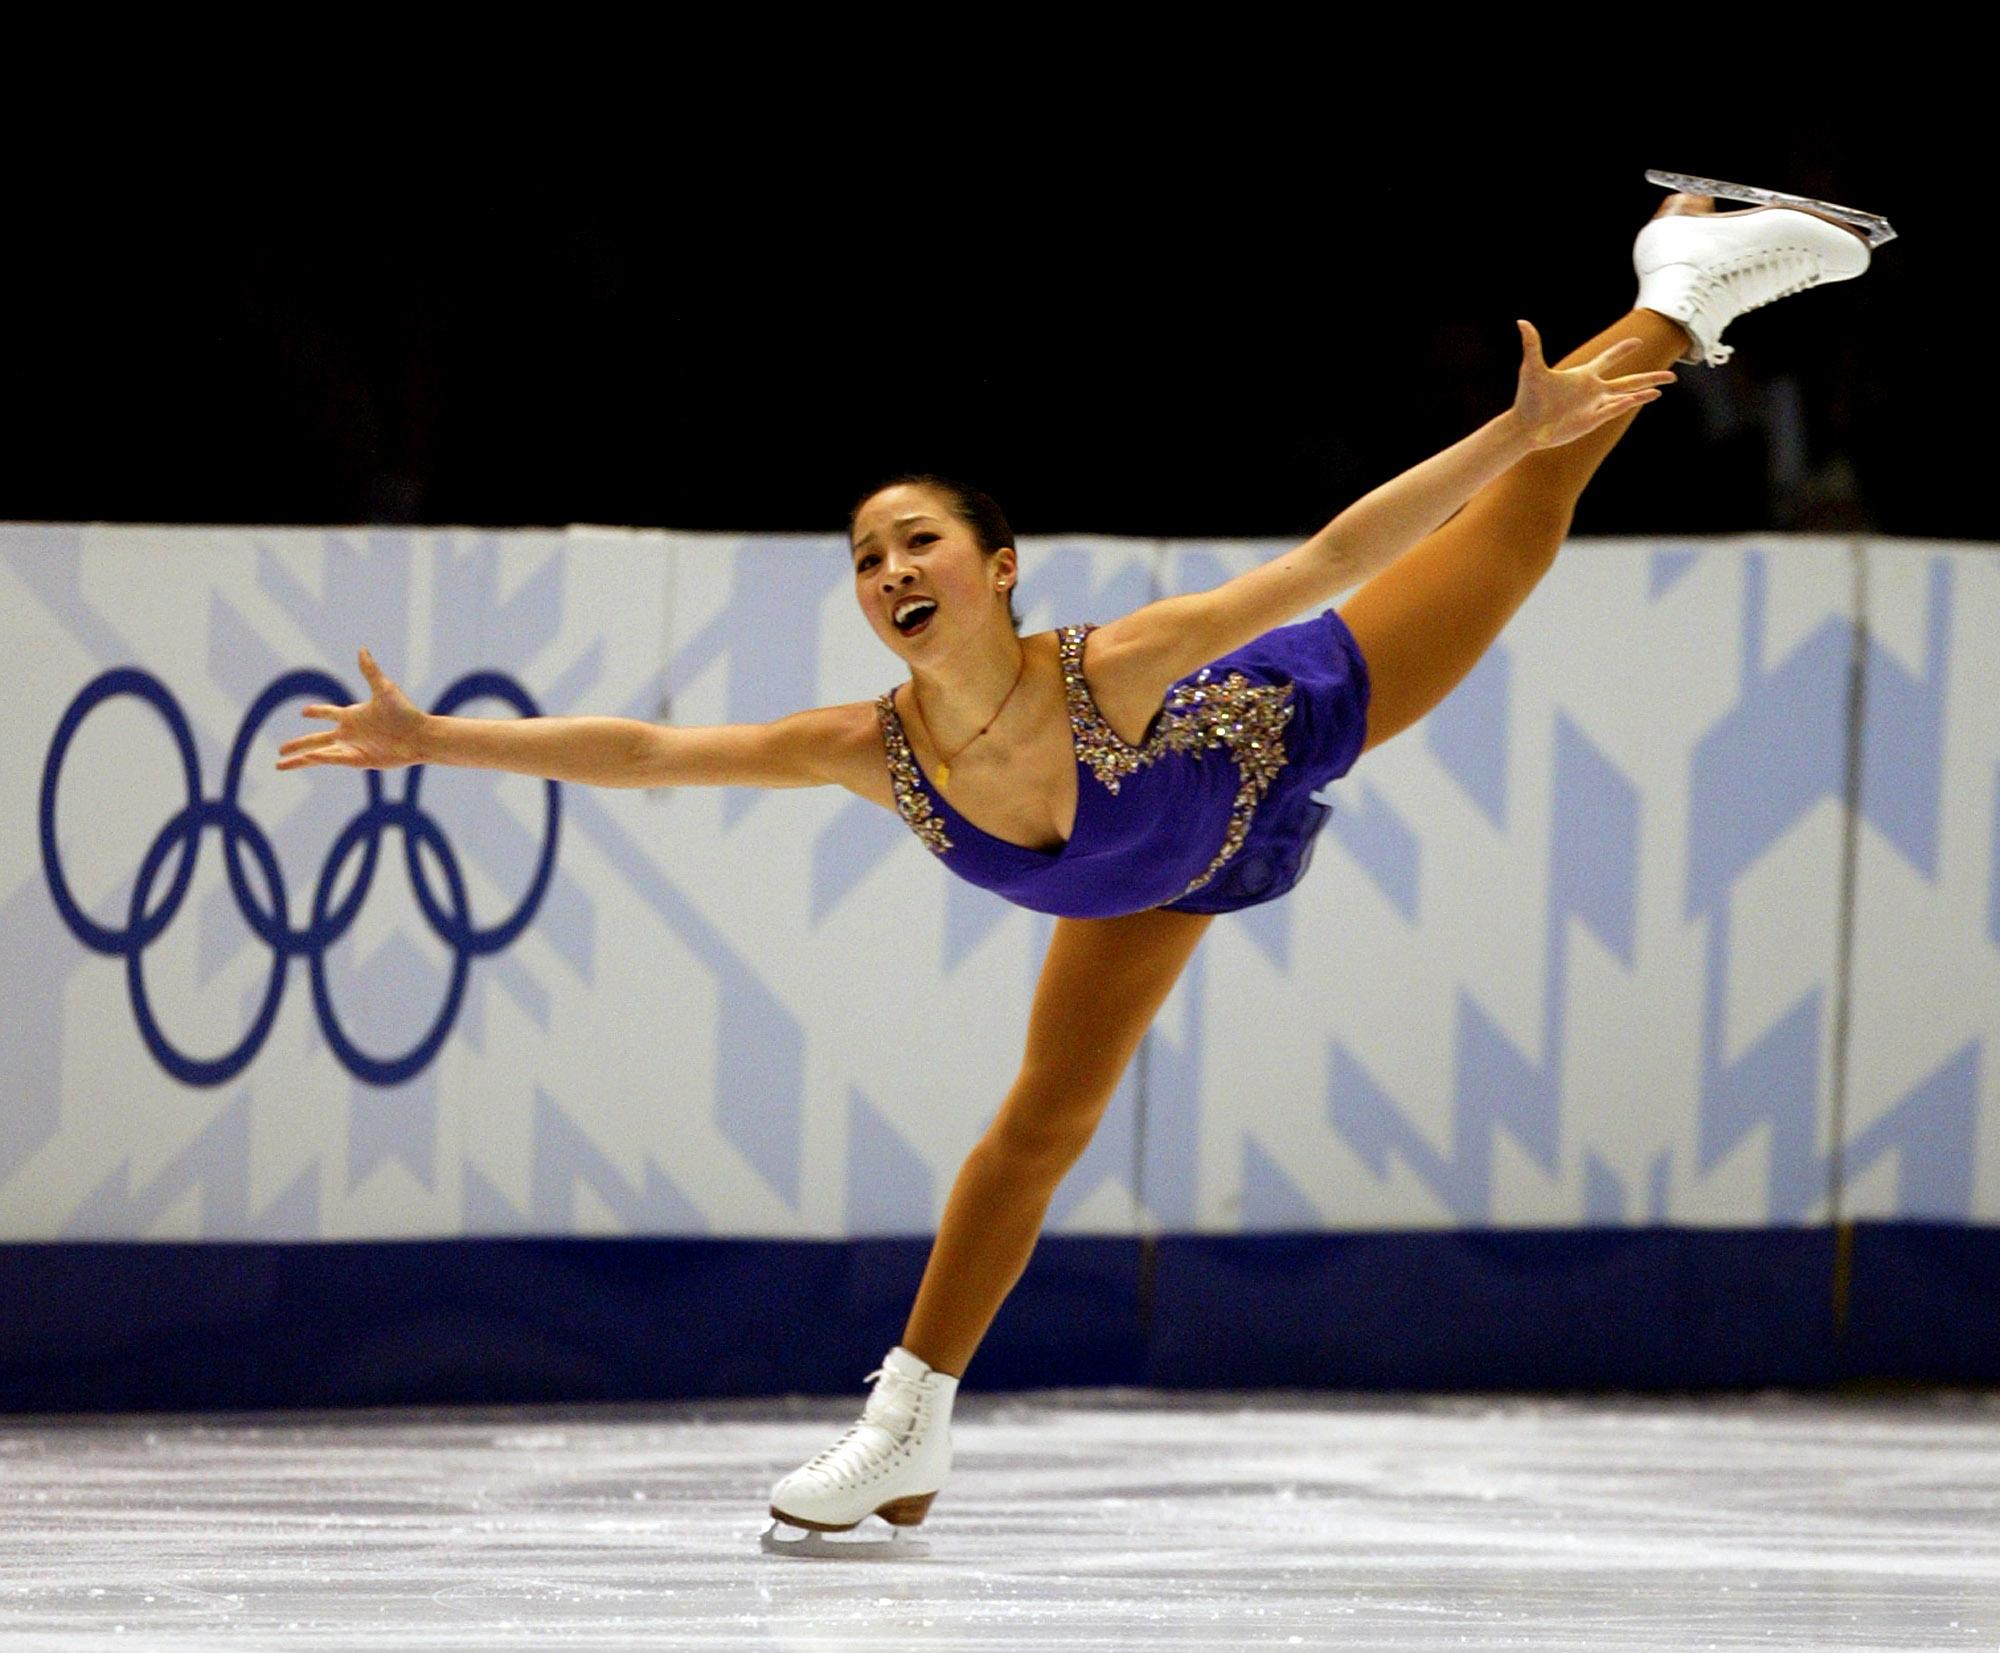 USA's skater Michelle Kwan skates during the first night of the Women's short program in Figure Skat